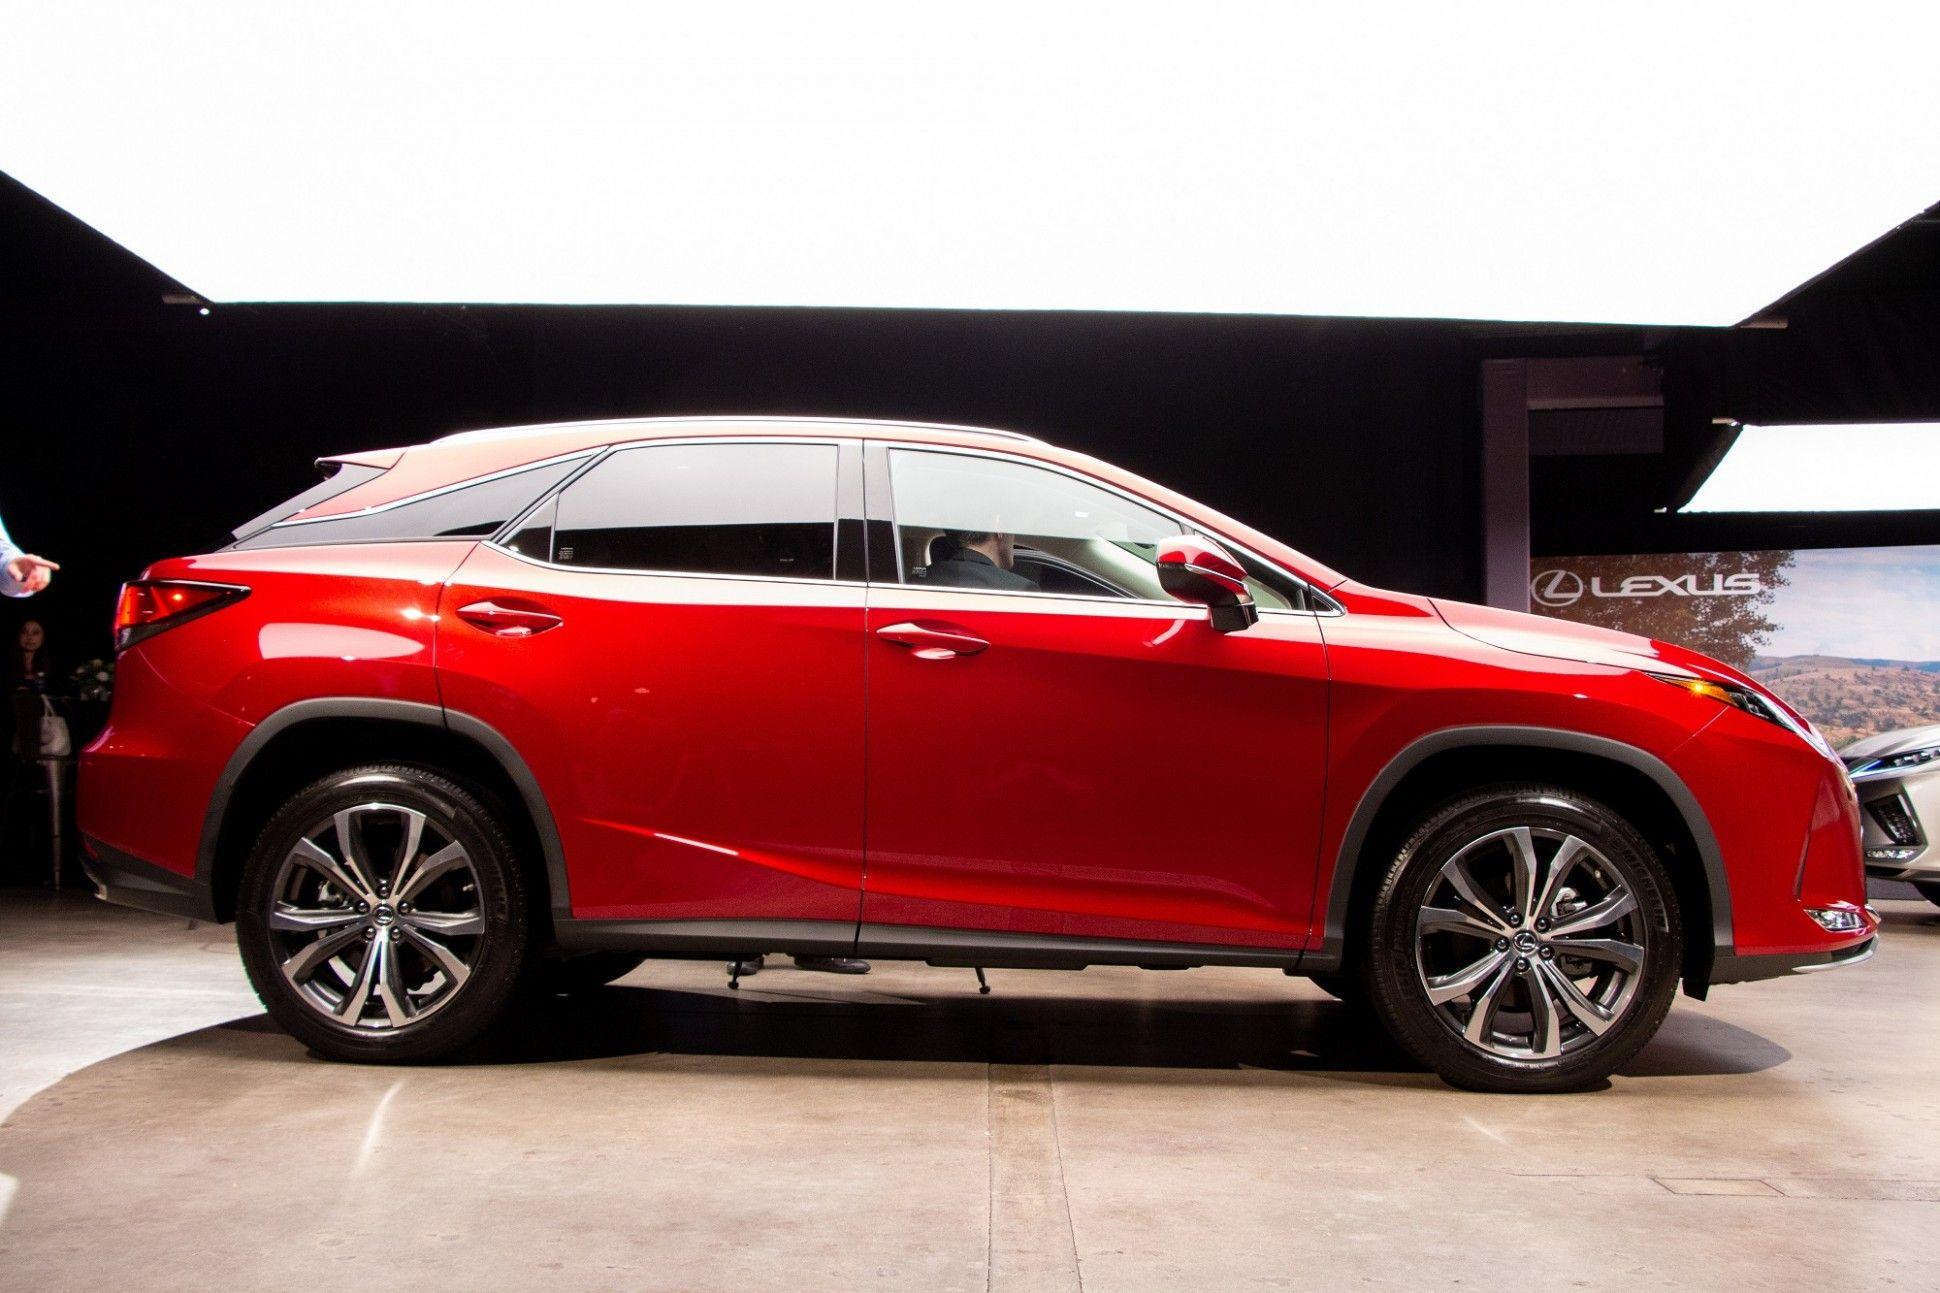 How Will 2020 Lexus Ux 250h Luxury Design Be In The Future How Will 2020 Lexus Ux 250h Luxury Design Be In The Future 2020 Lexus Colorful Interiors Automotive News Interior